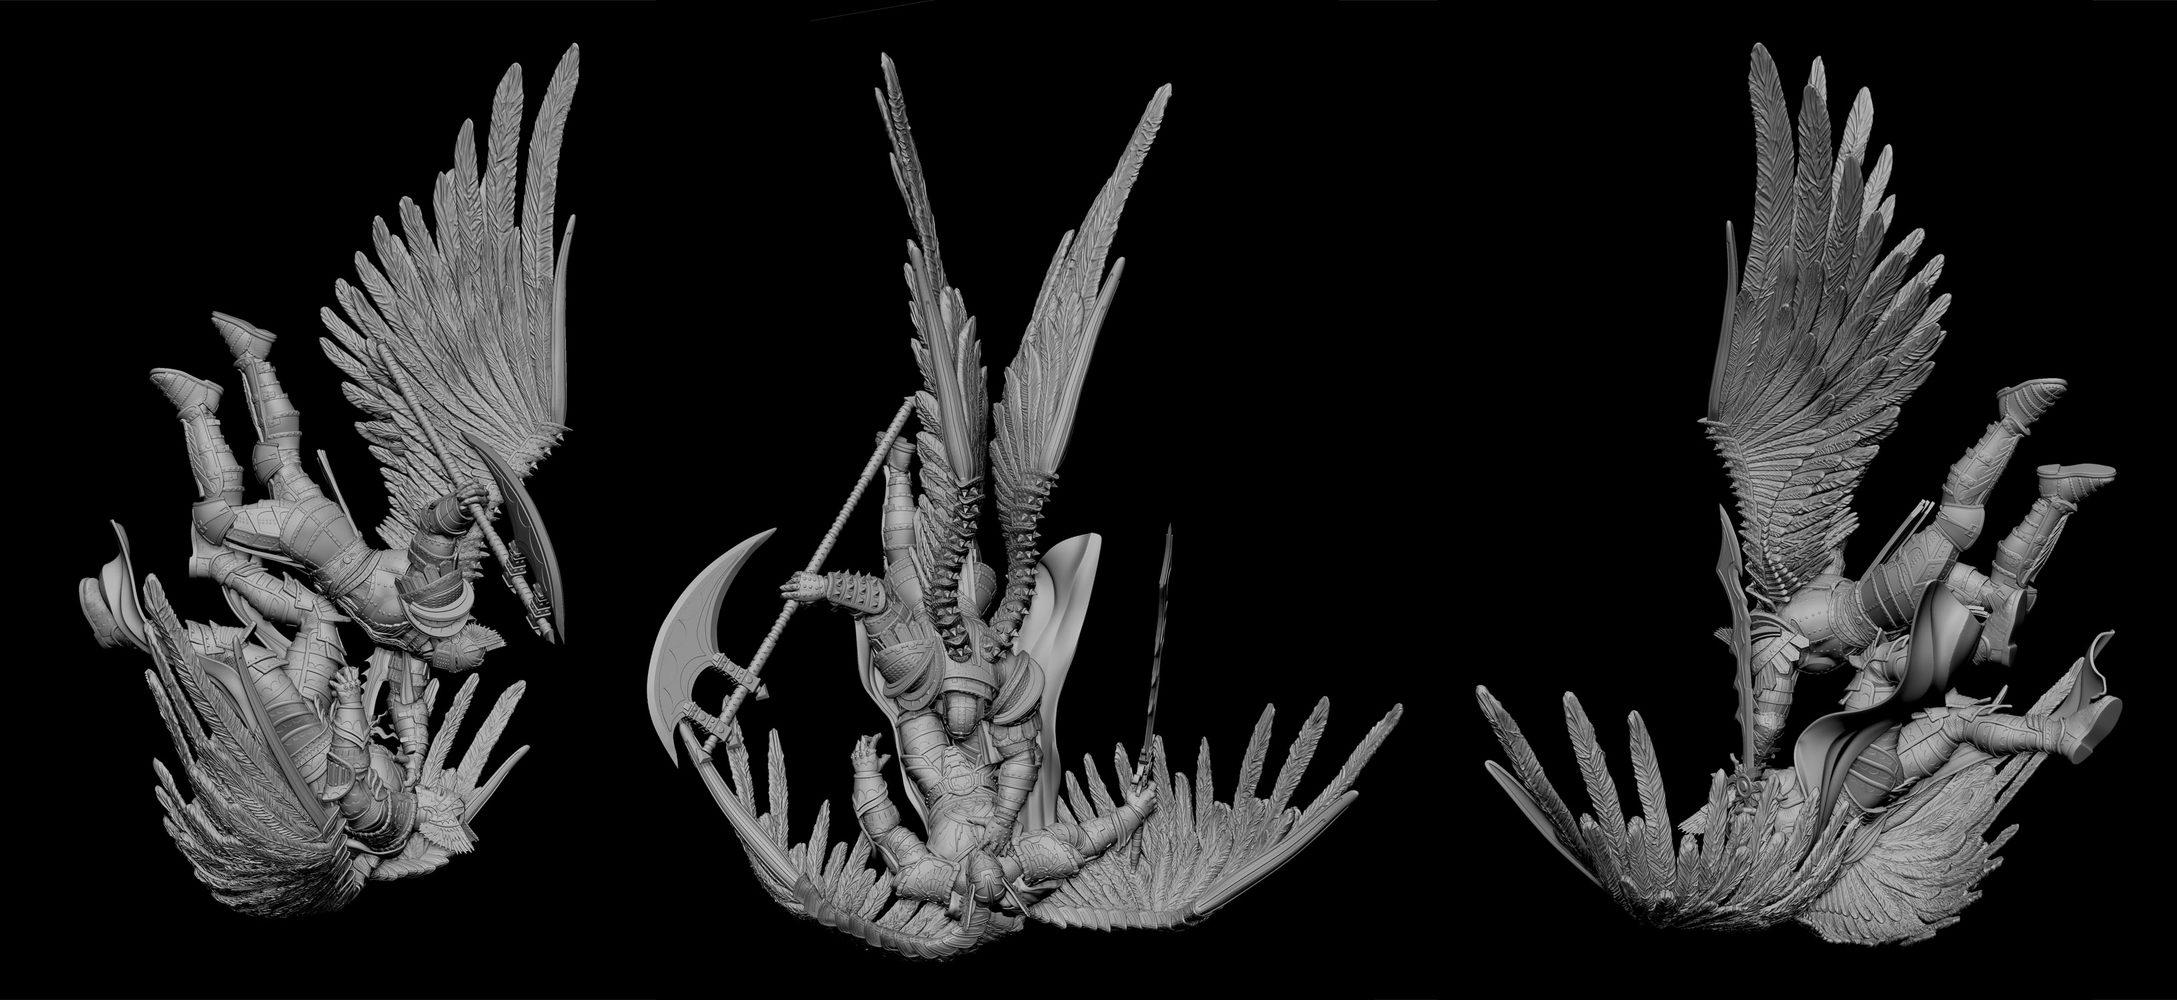 Falling zbrush model by alterton on DeviantArt